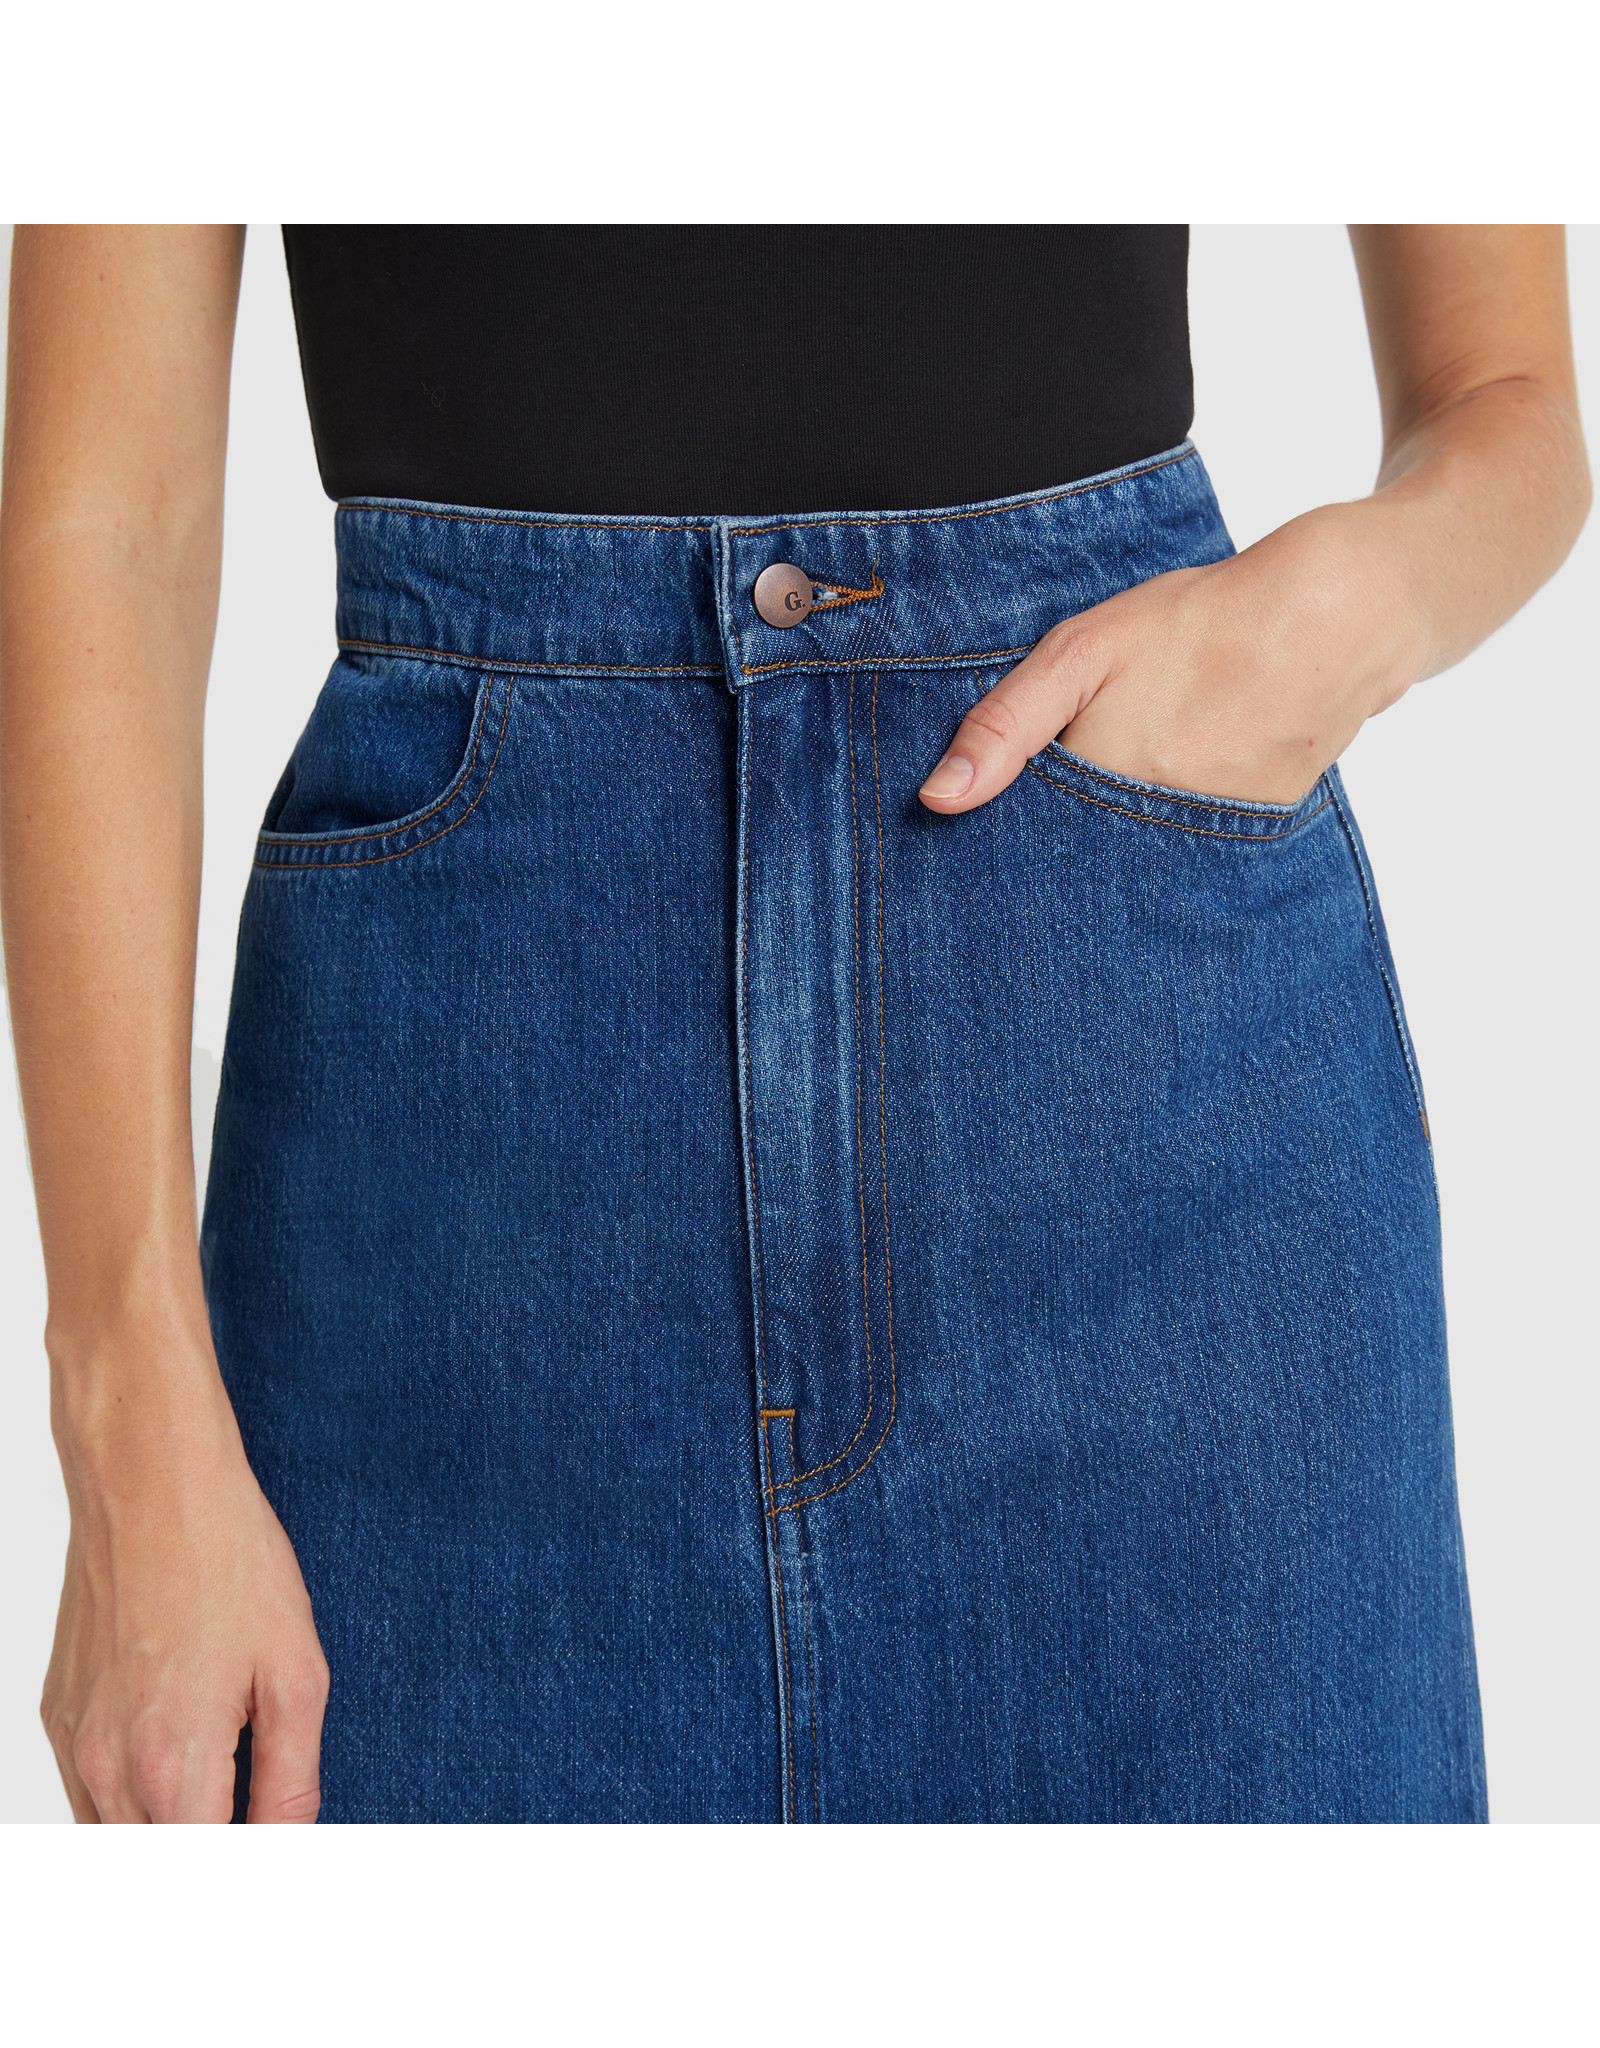 G. Label G. Label Yu Denim Pencil Skirt (Color: Medium Blue Wash, Size: 27)